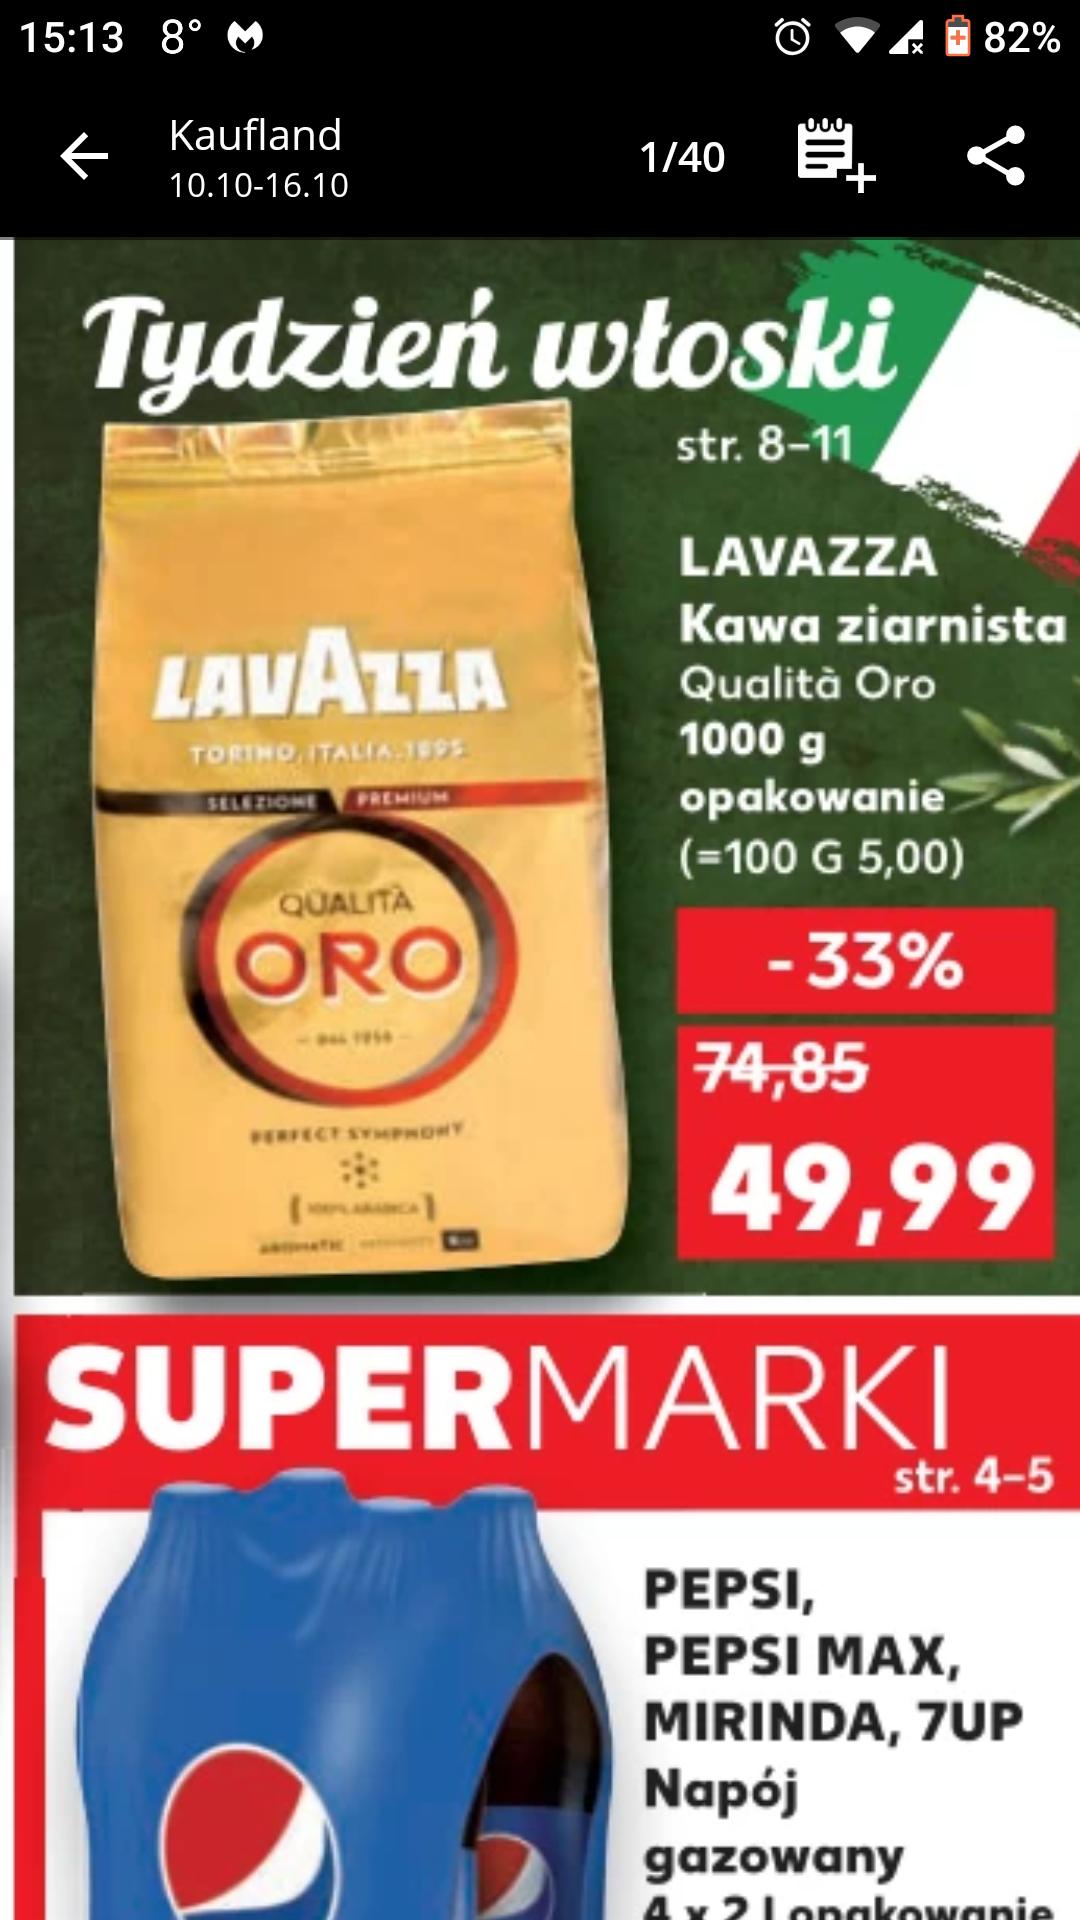 Lavazza kawa ziarnista Qualita Oro 1000 g @Kaufland 49,99 zł